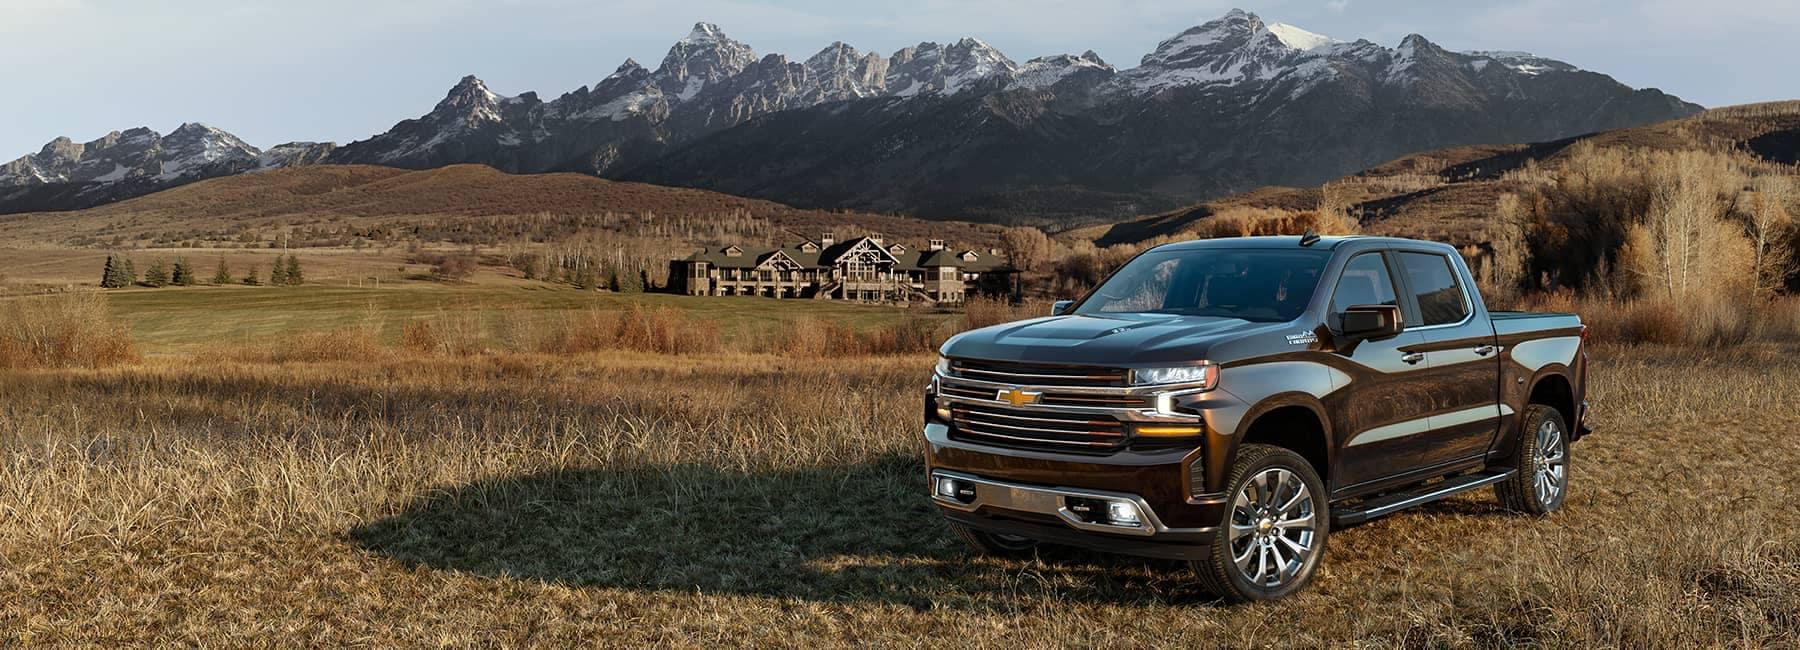 Dark 2021 Chevrolet Silverado 1500LD Crew Cab parked in a Mountain Valley